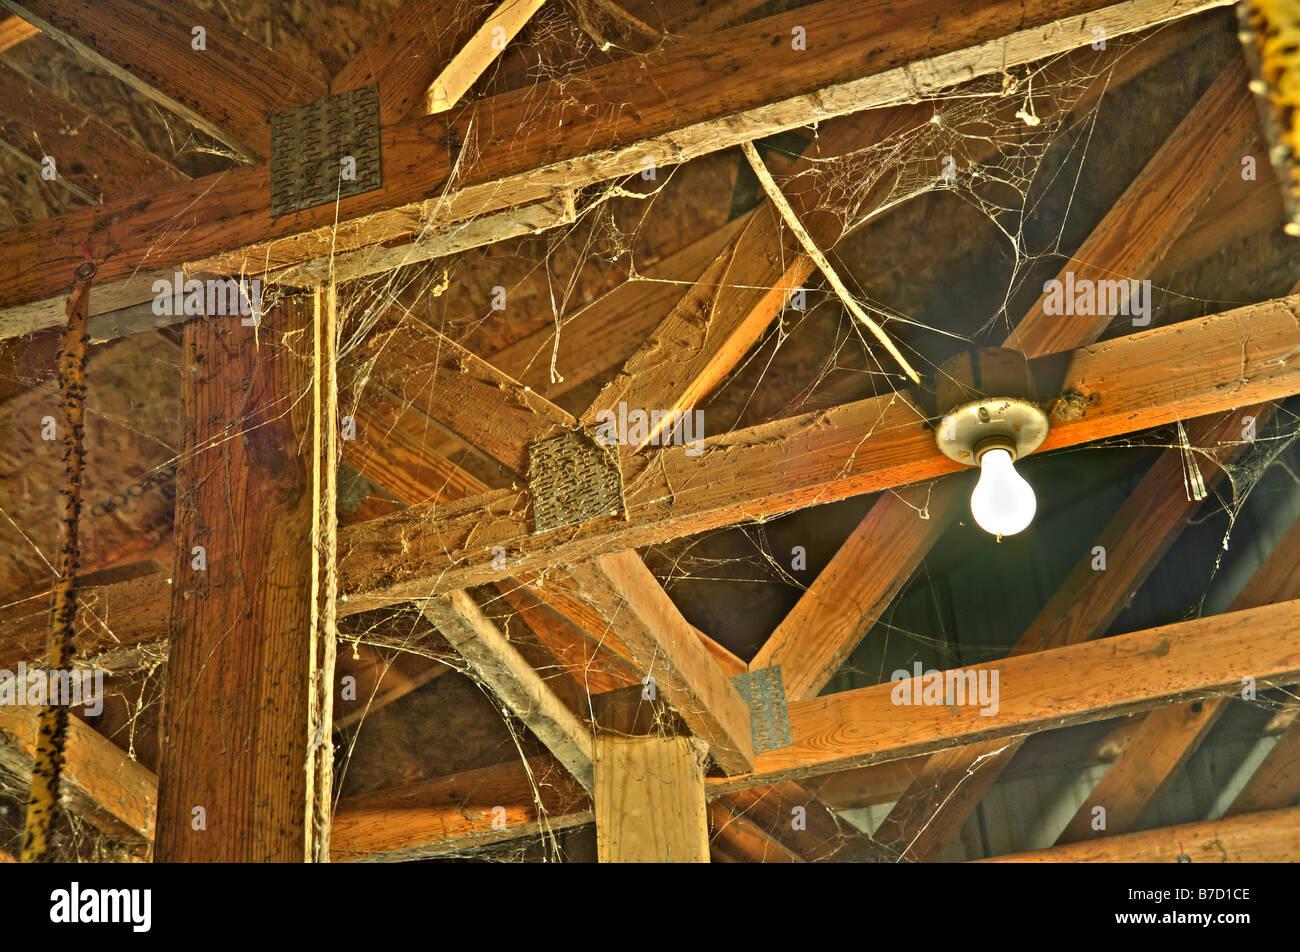 Cobwebs Amp Light Bulb In Attic Stock Photo Royalty Free